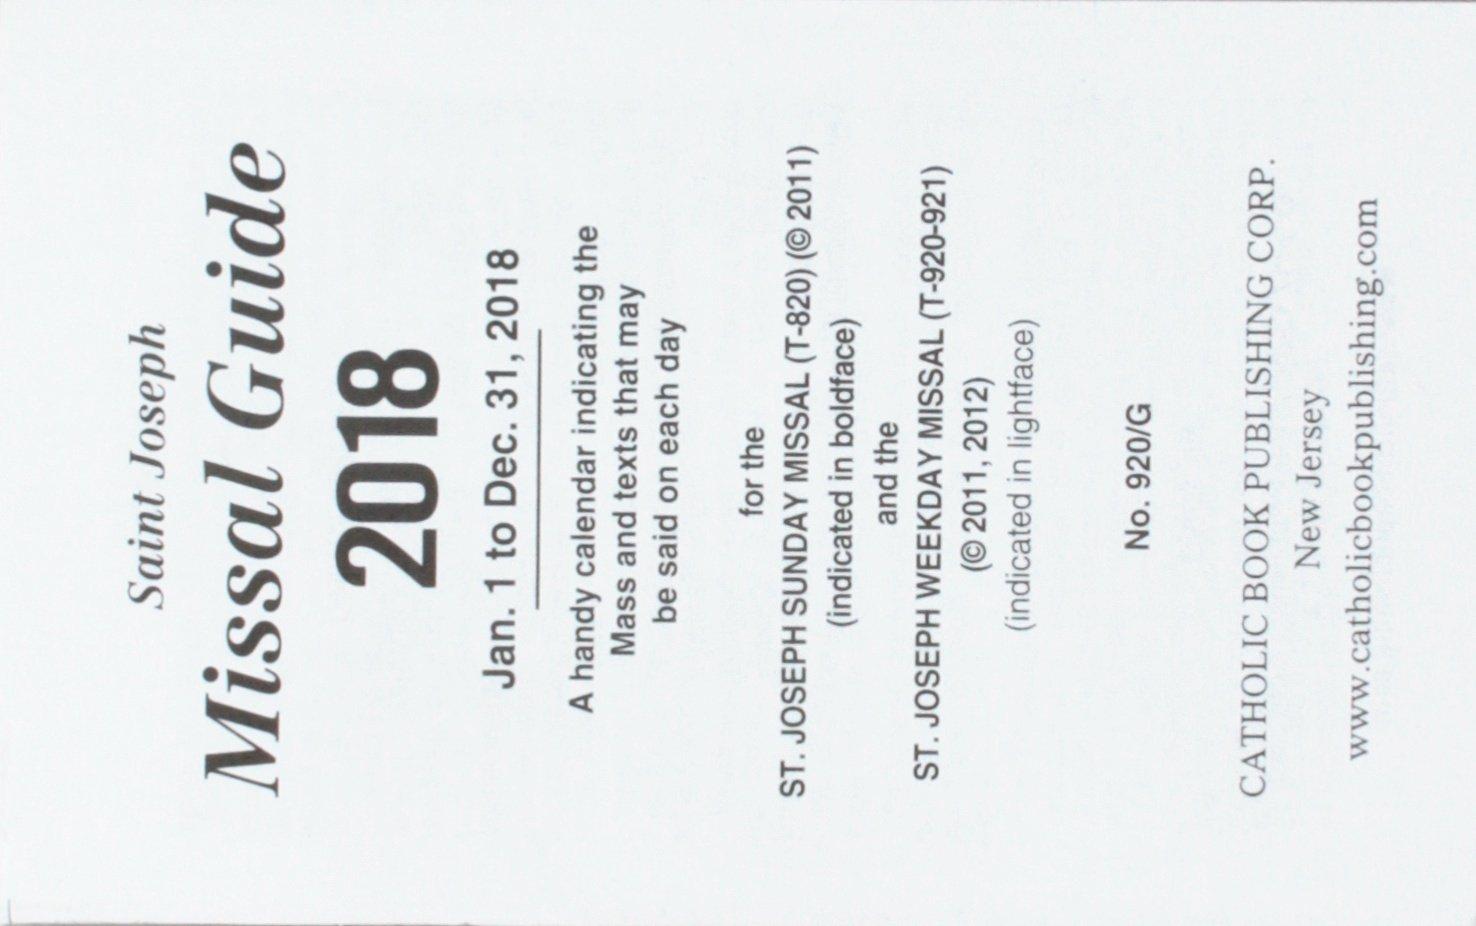 St. Joseph: St. Joseph Annual Missal Guide for 2018: International  Commission on English in the Liturgy: 9781941243893: Amazon.com: Books